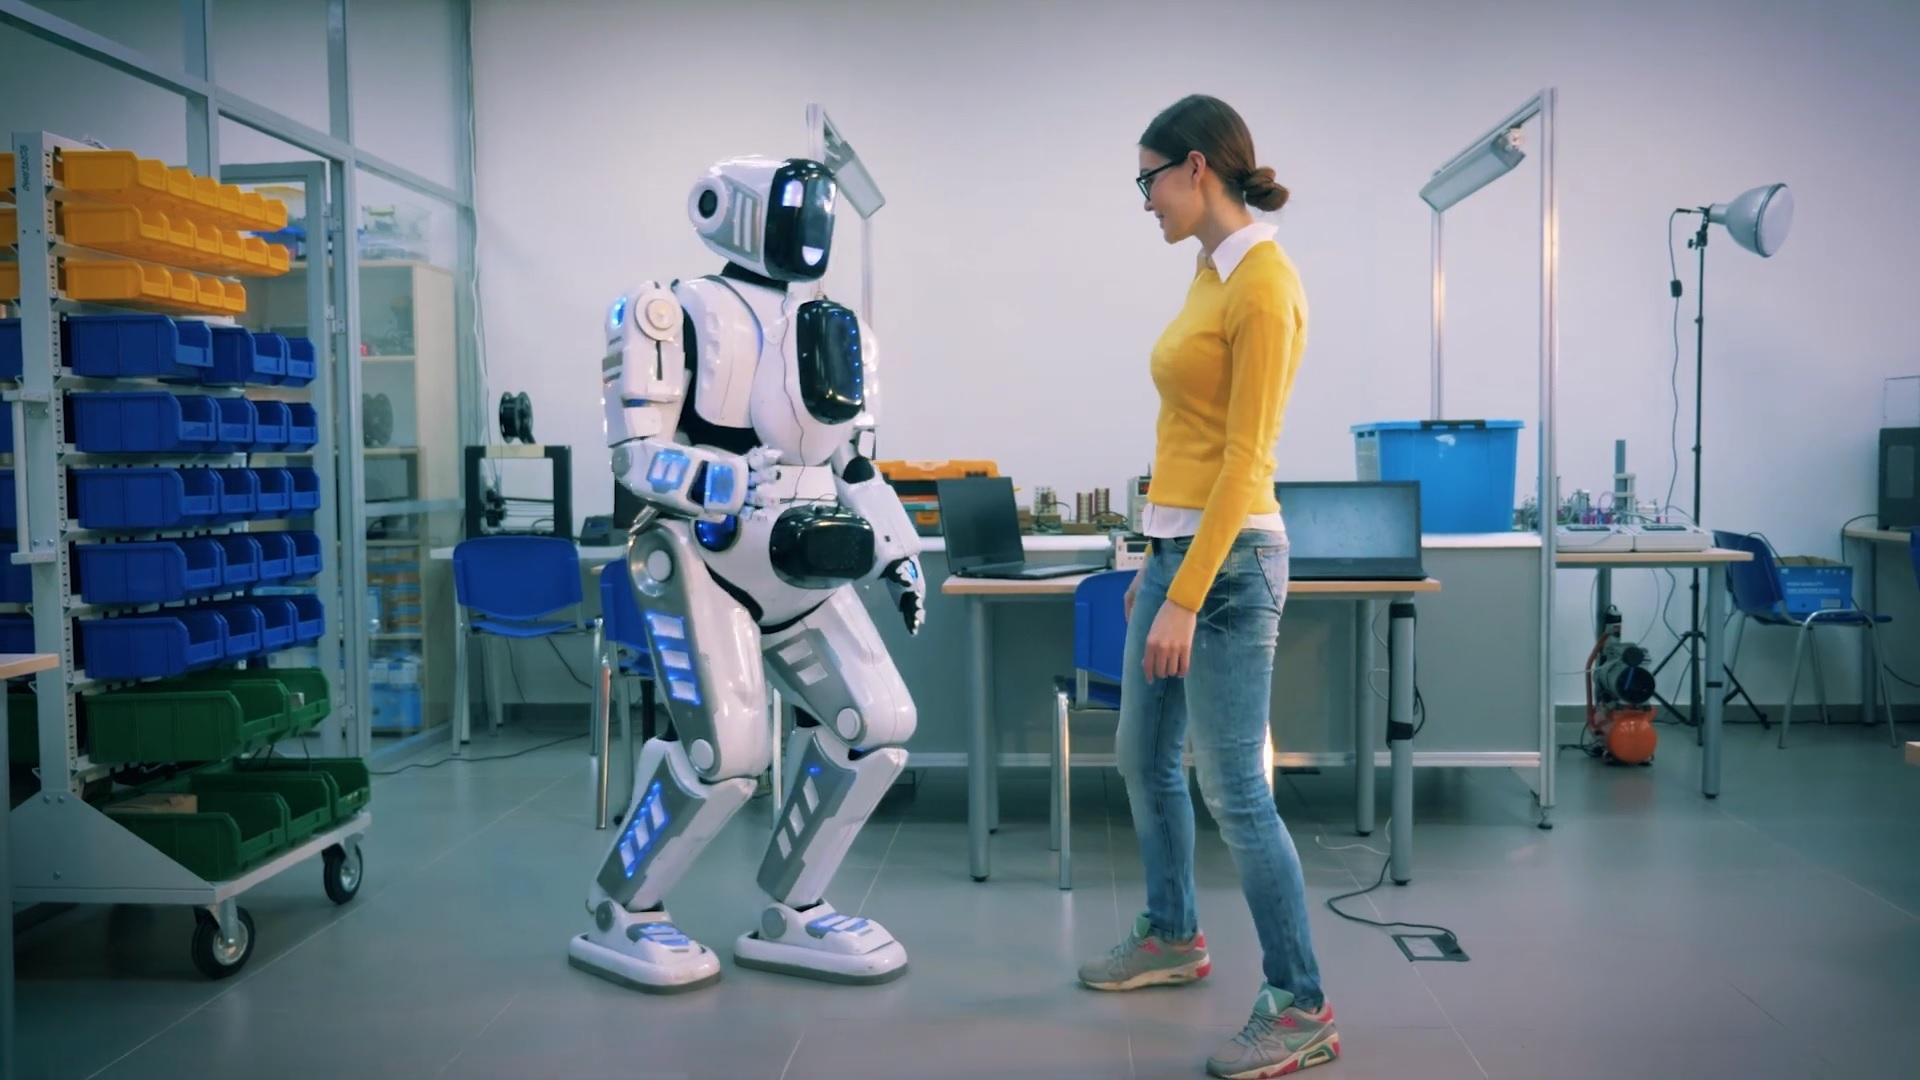 robotic help manpower scarcity